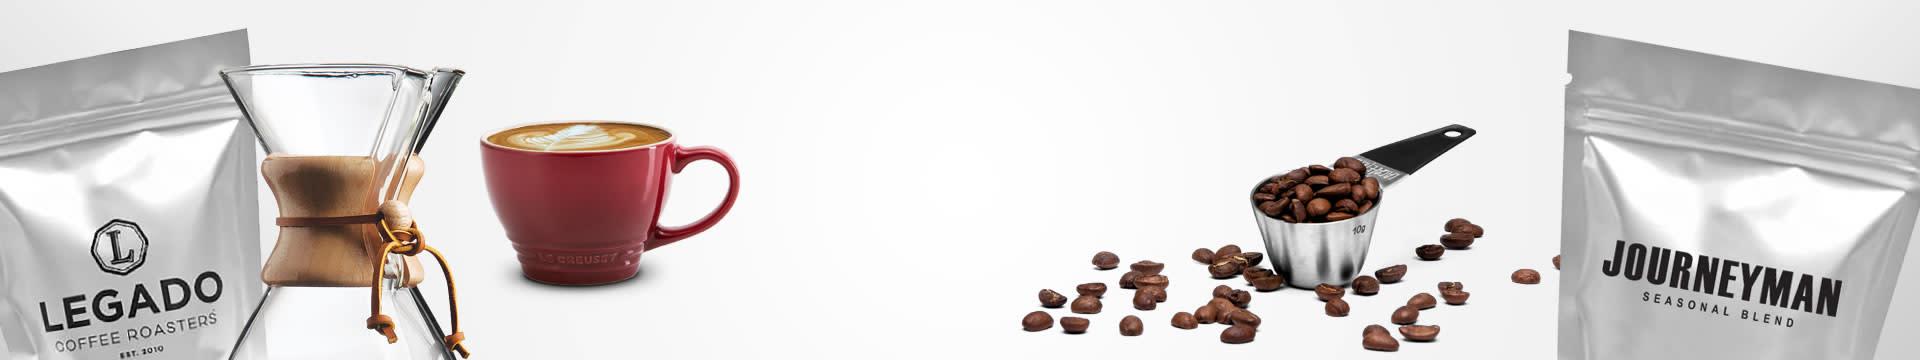 Banner image of Legado Coffee Roasters